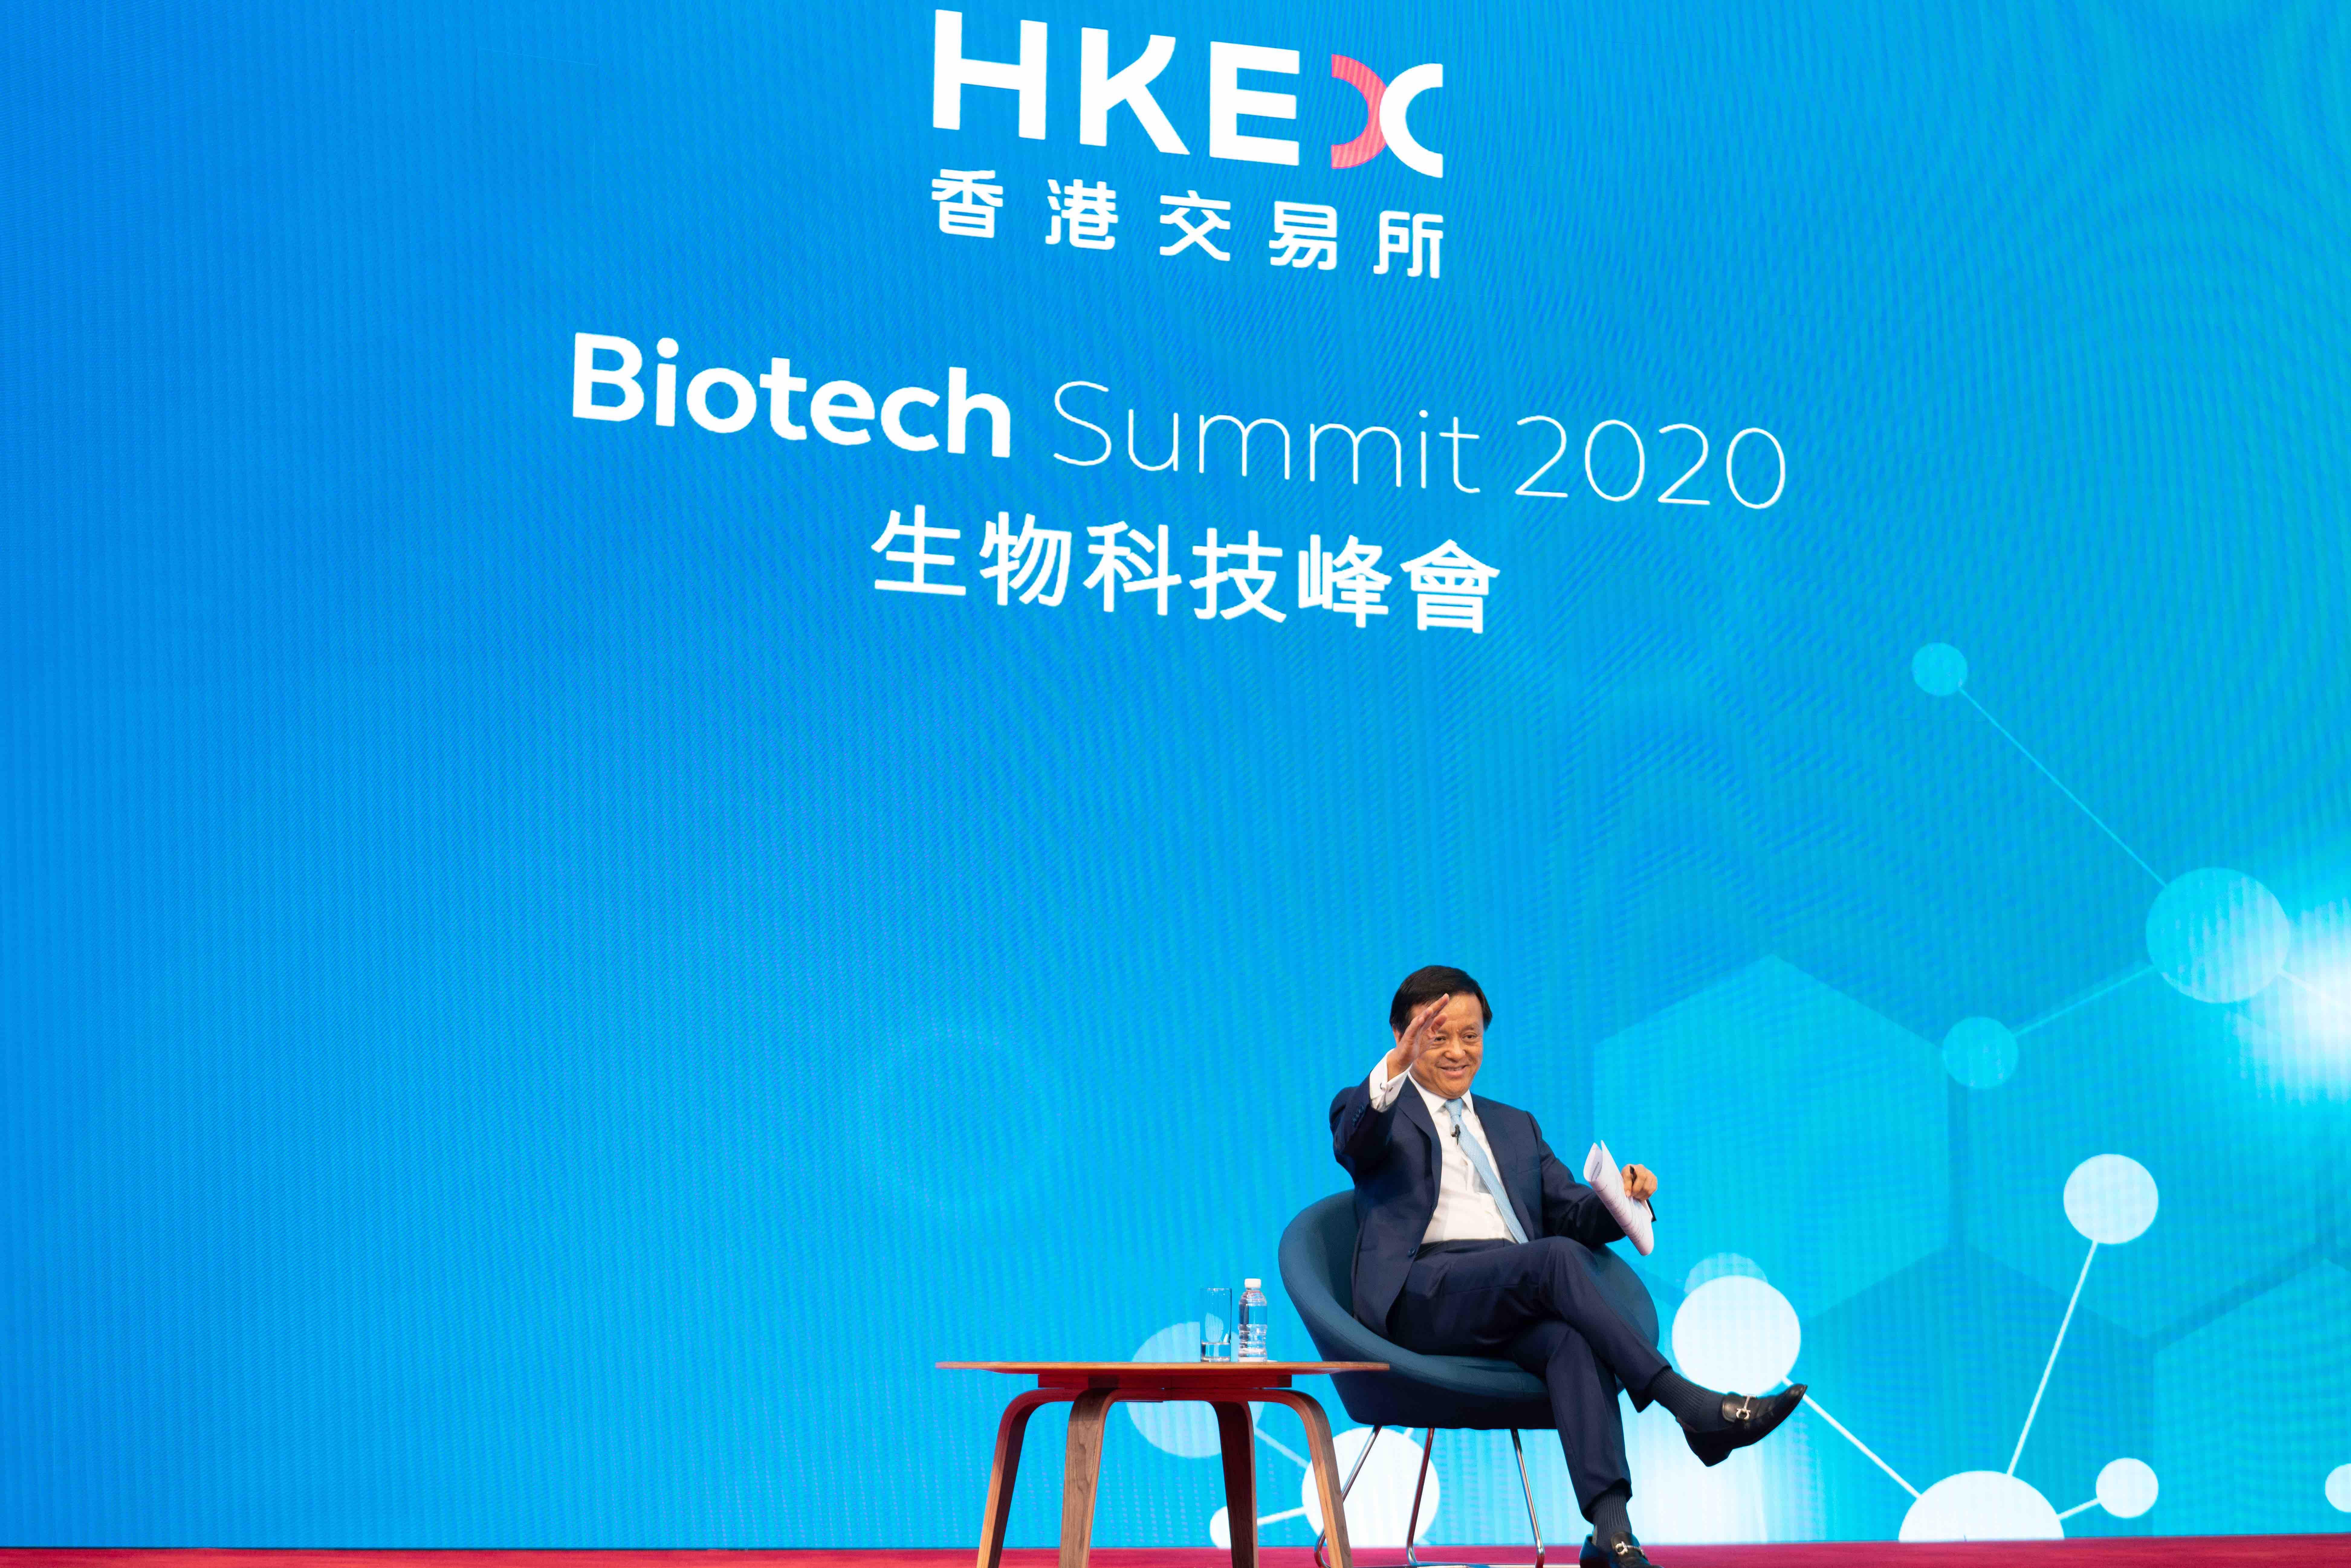 20200901_BioTech Forum_Charles_12.jpg